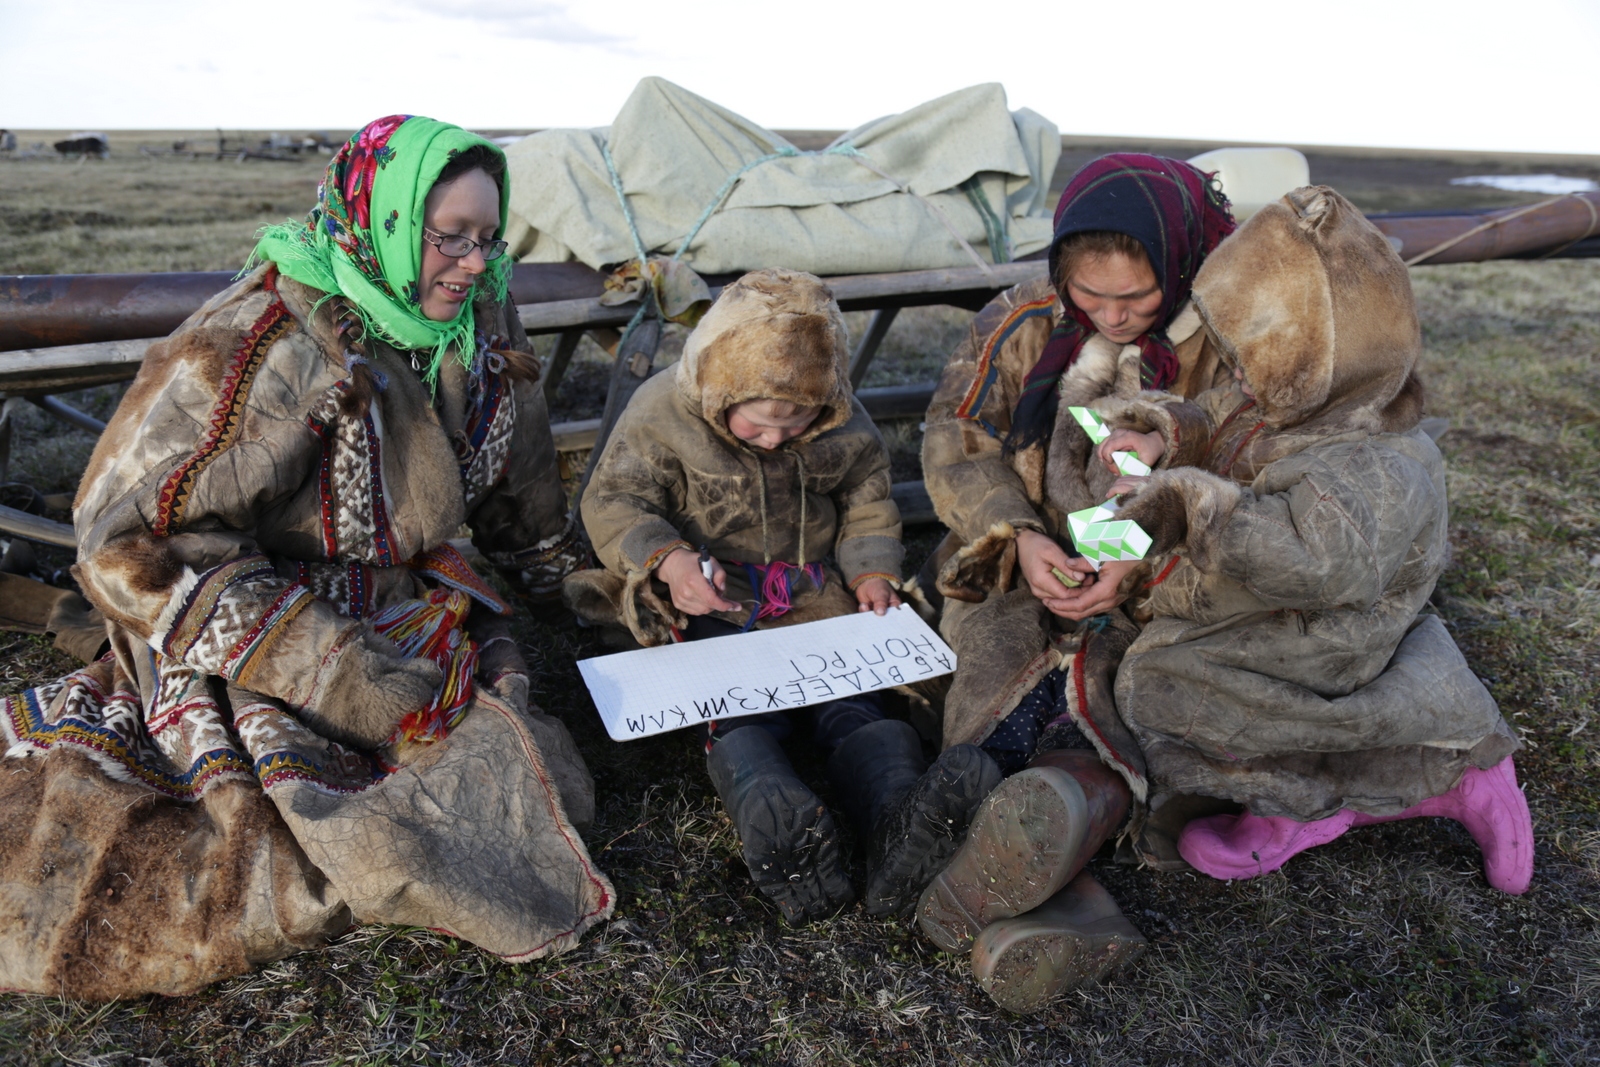 Снимка: Александра Терьохина / Александр Волковицки / yamalexpedition.ru